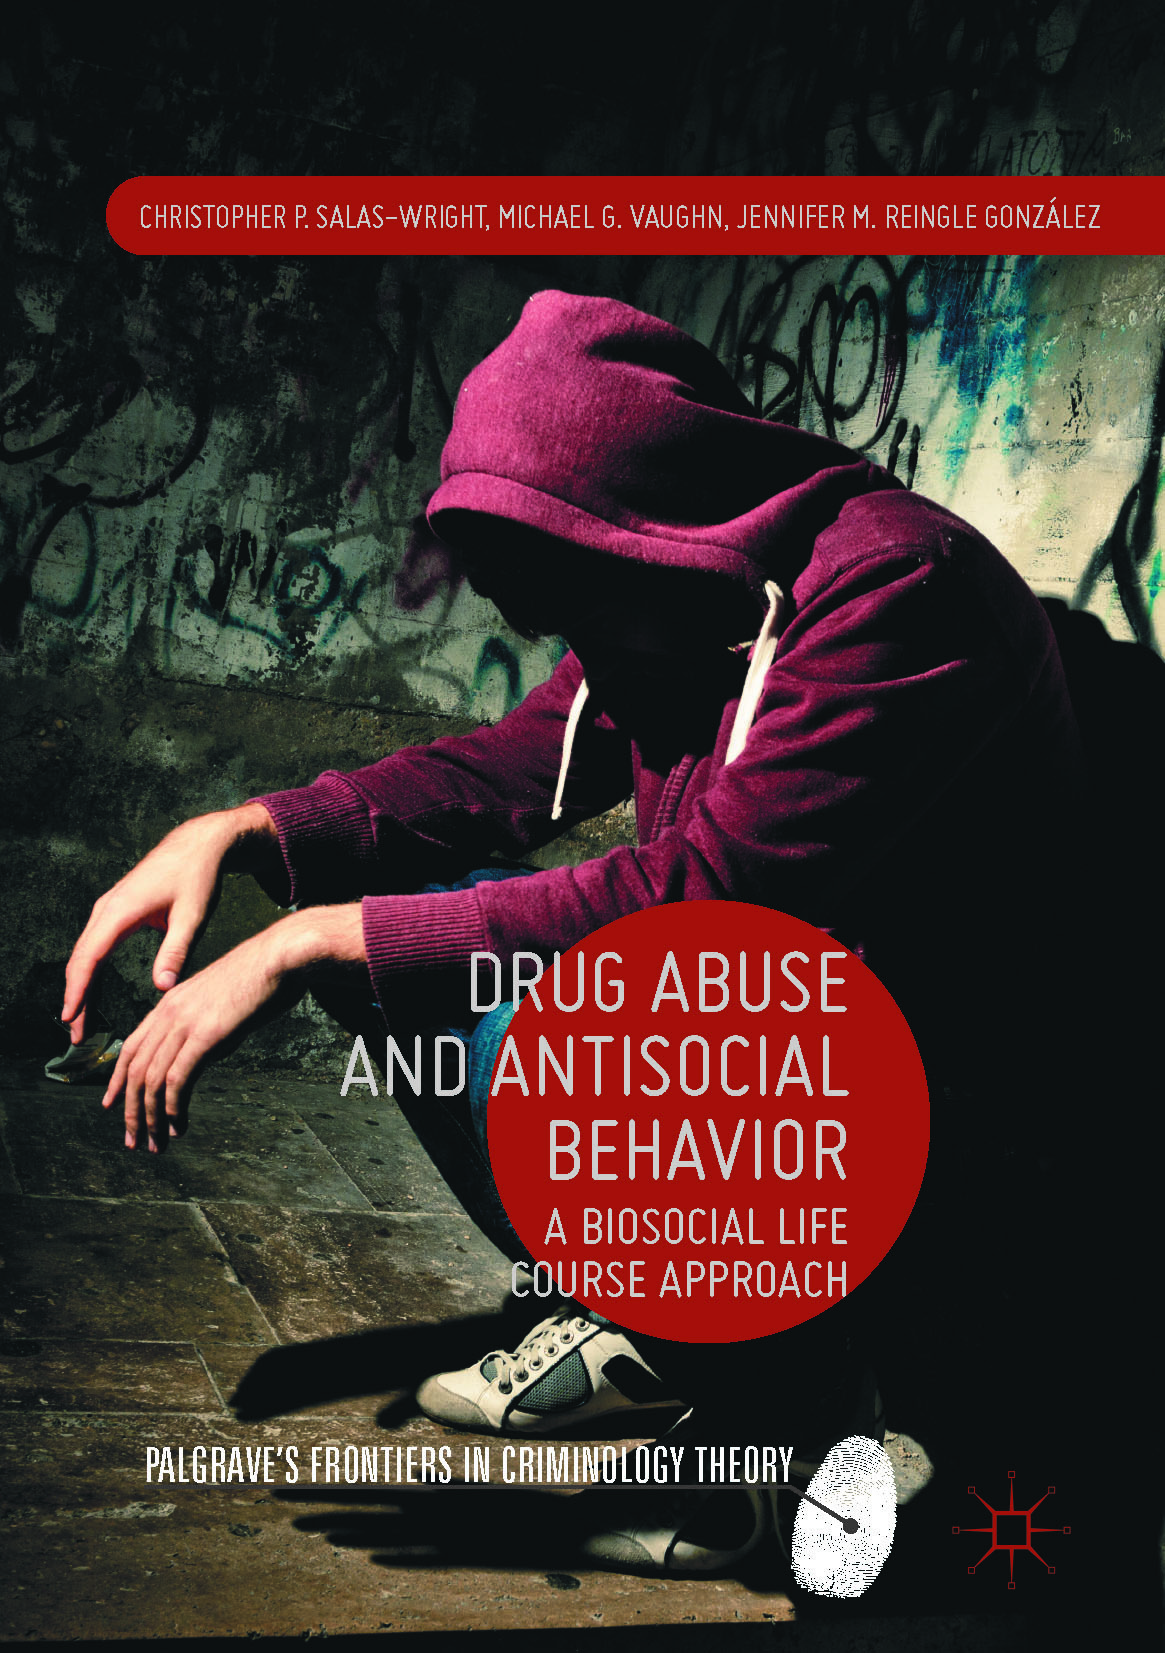 González, Jennifer M. Reingle - Drug Abuse and Antisocial Behavior, ebook